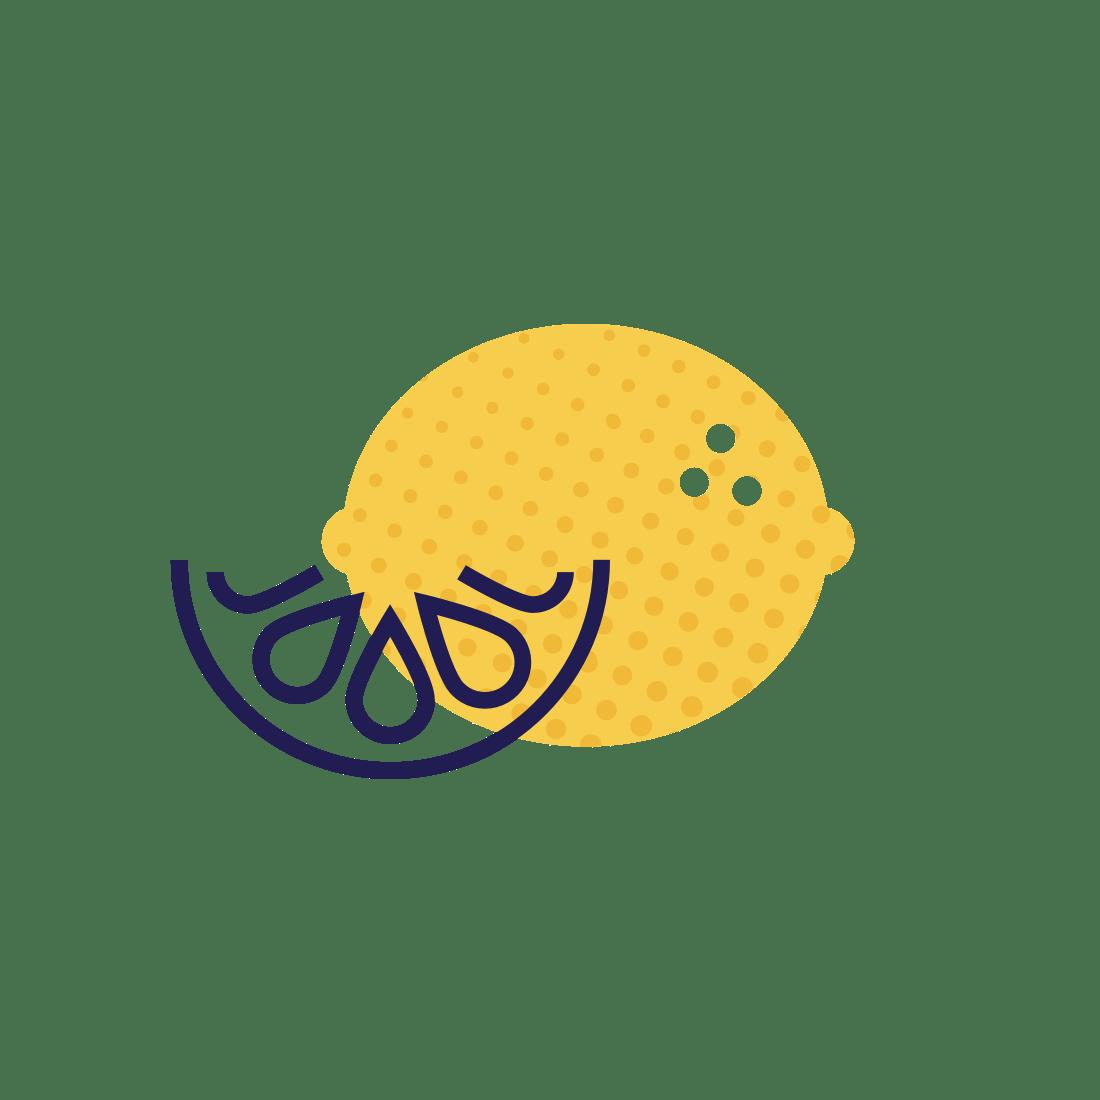 medium resolution of lemon